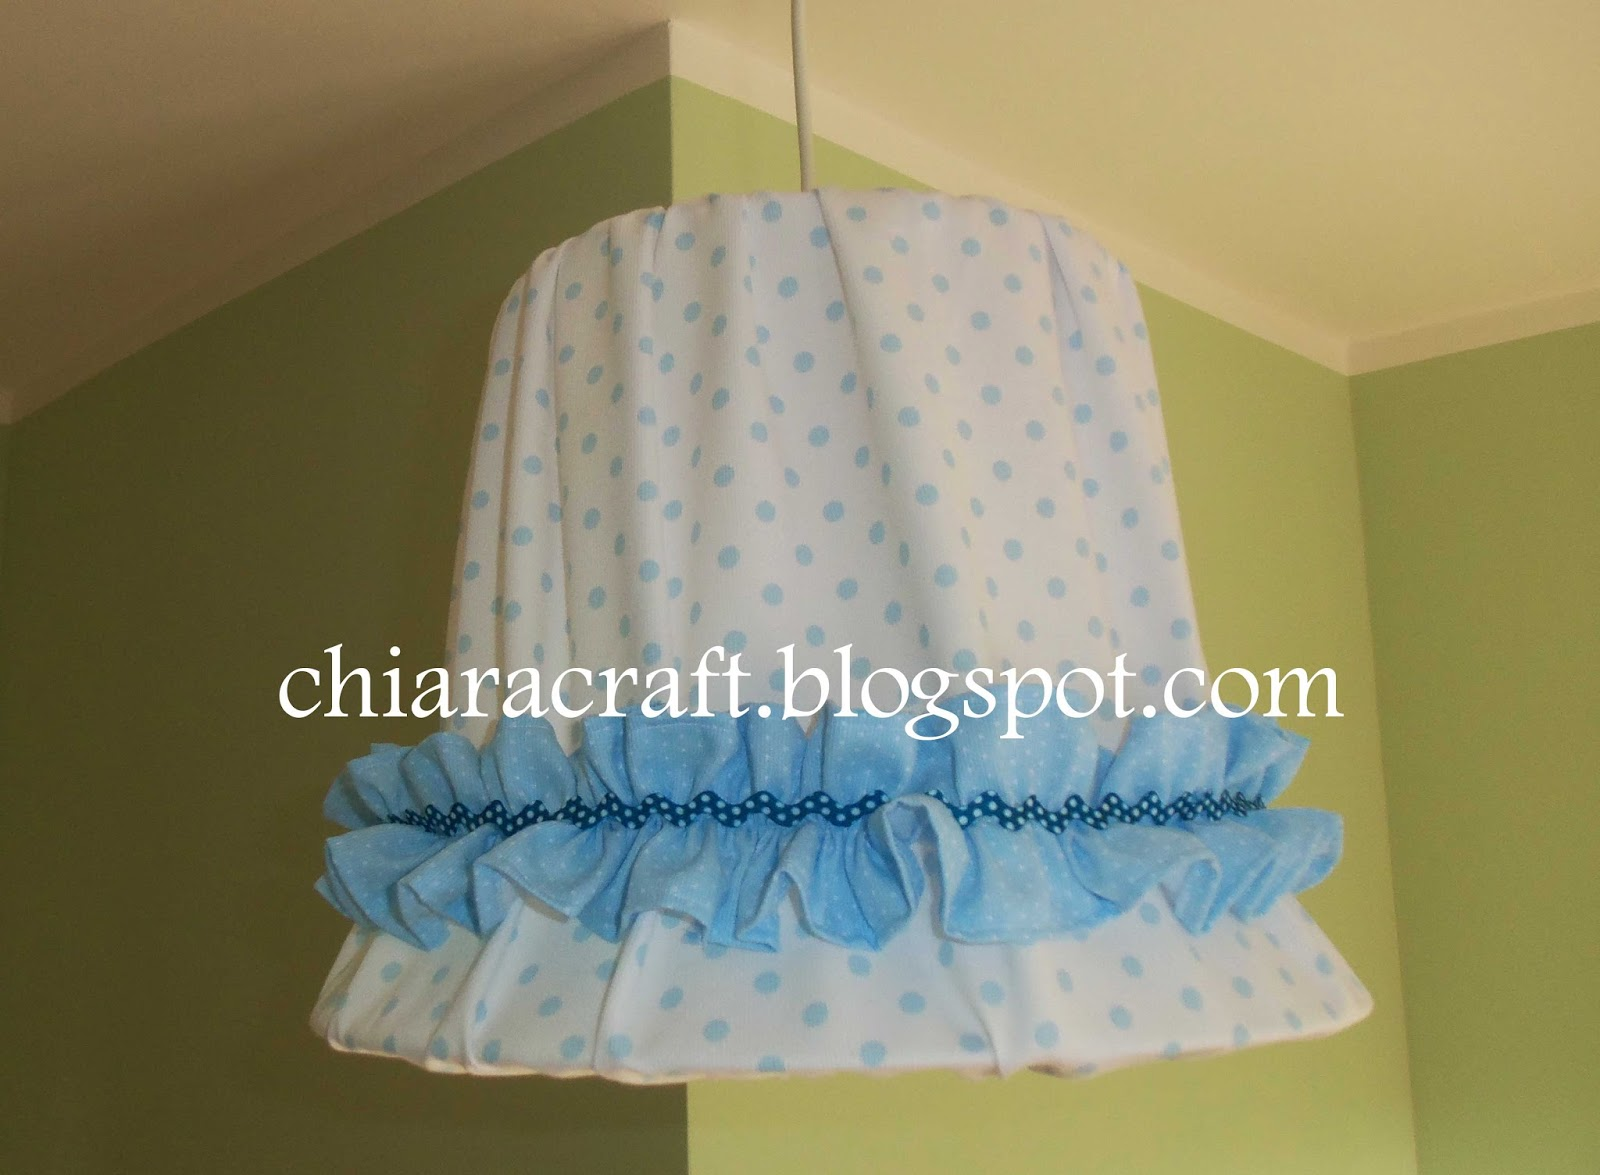 lampadario stoffa : Chiara: Lampadario di stoffa handmade - Baby fabric chandelier ...